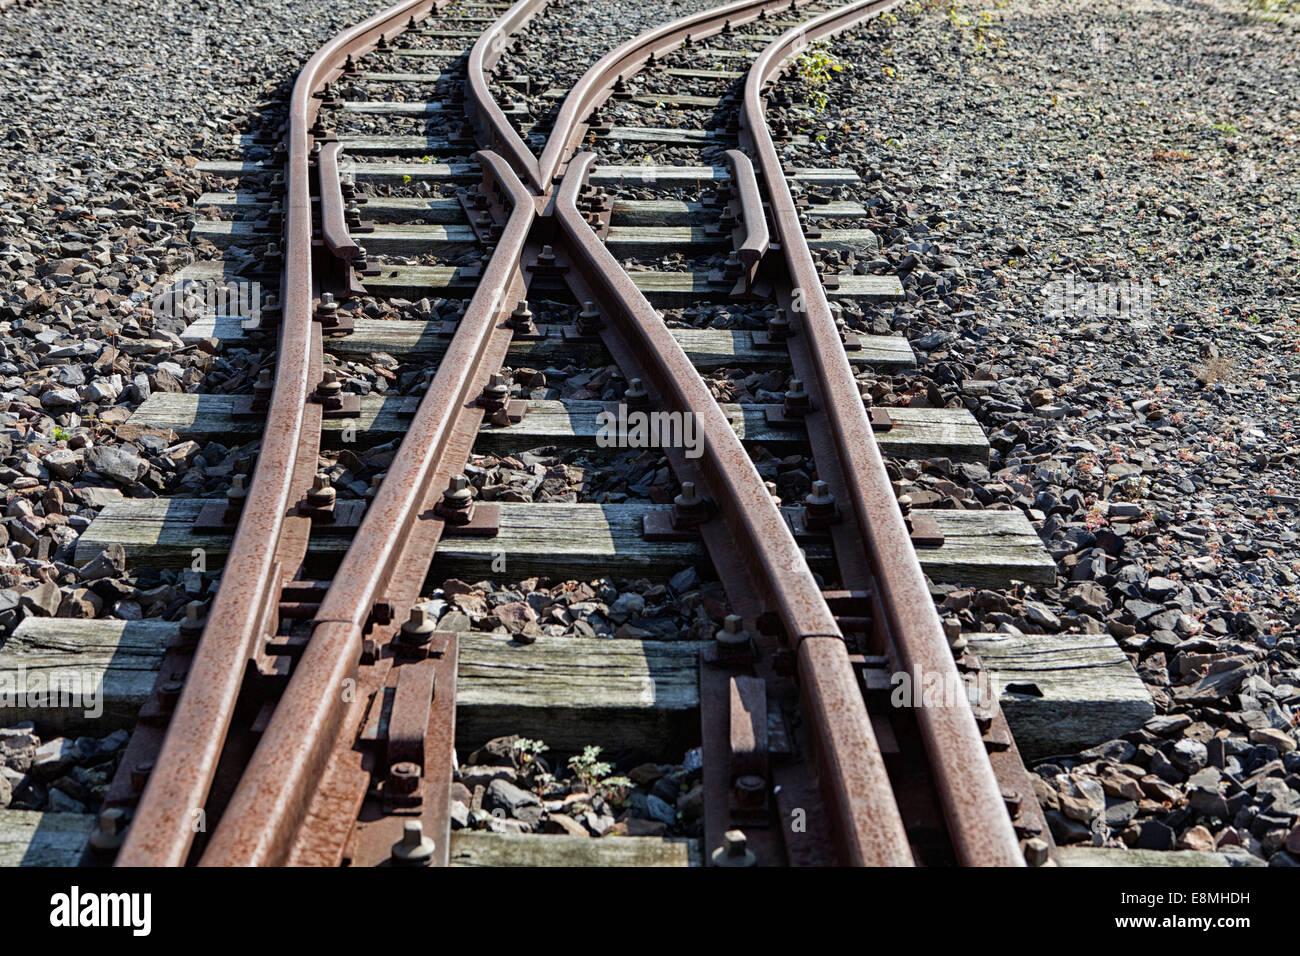 Train tracks, Germany, Europe, Stock Photo